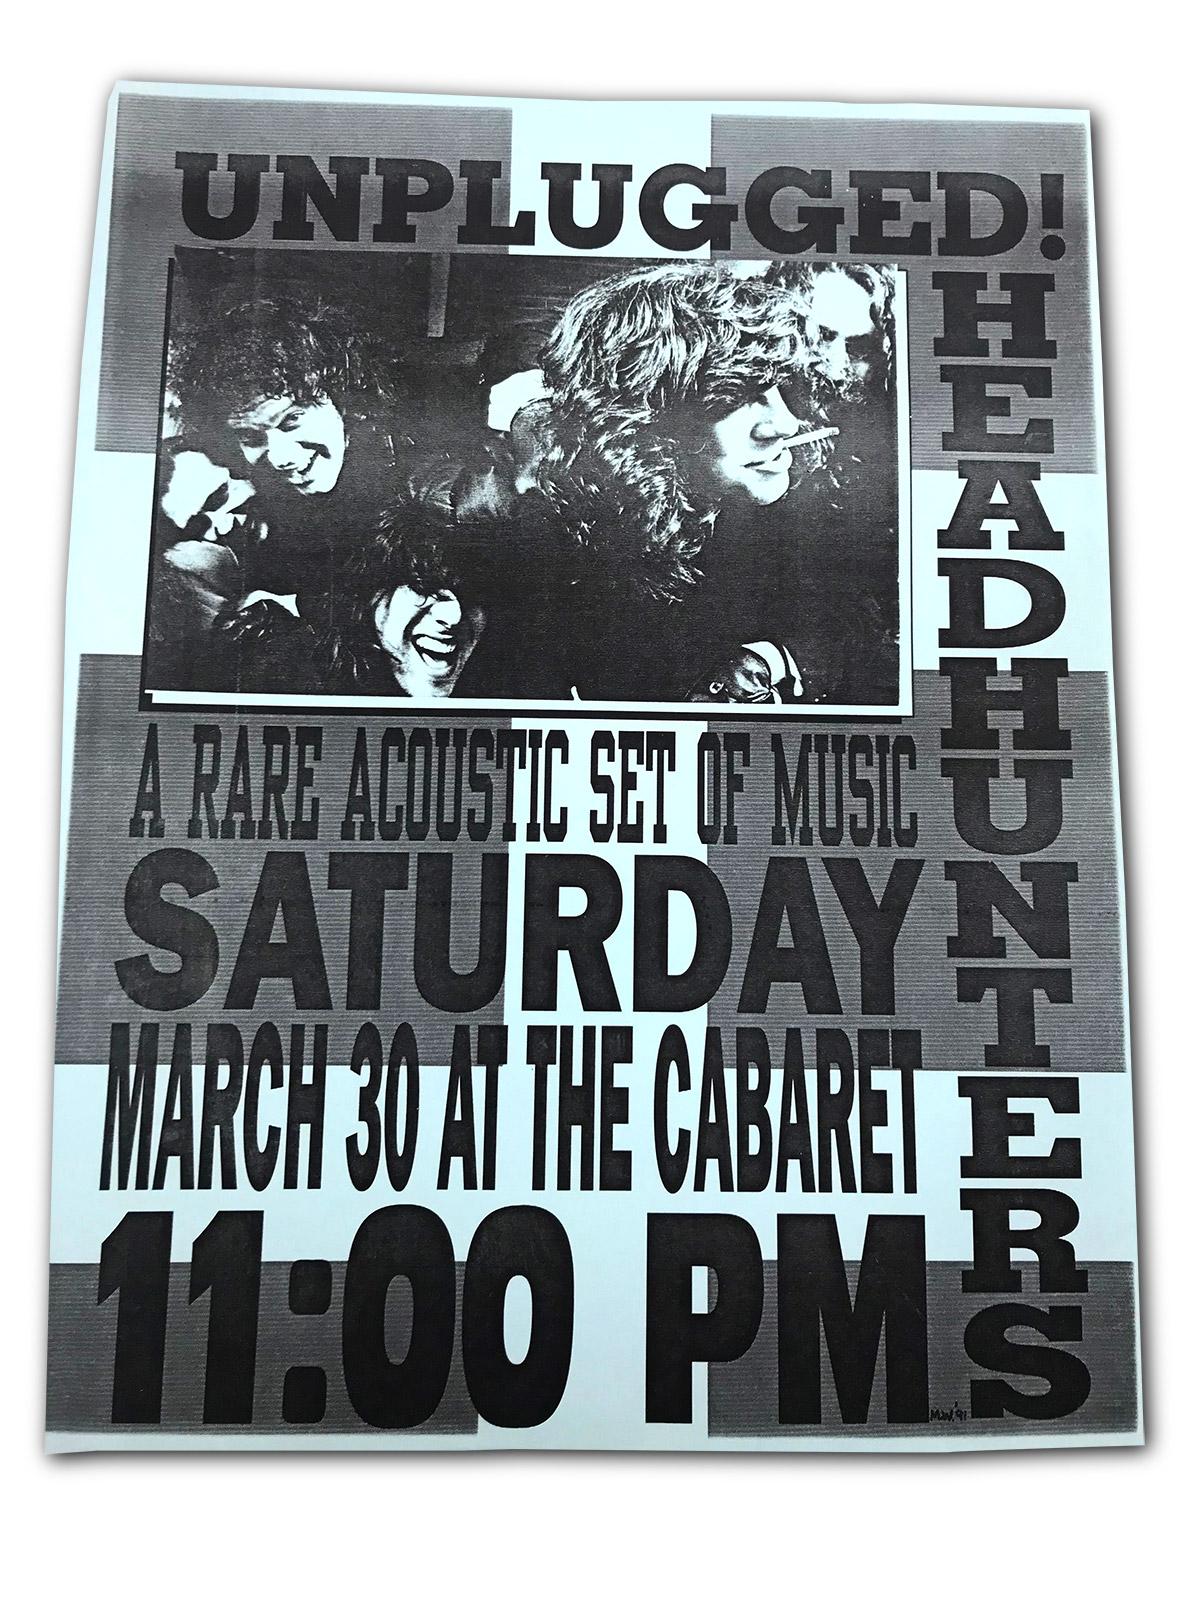 Headhunters, unplugged, the cabaret, buffalo ny, man wisz, poster design, terry sullivan, matt smith